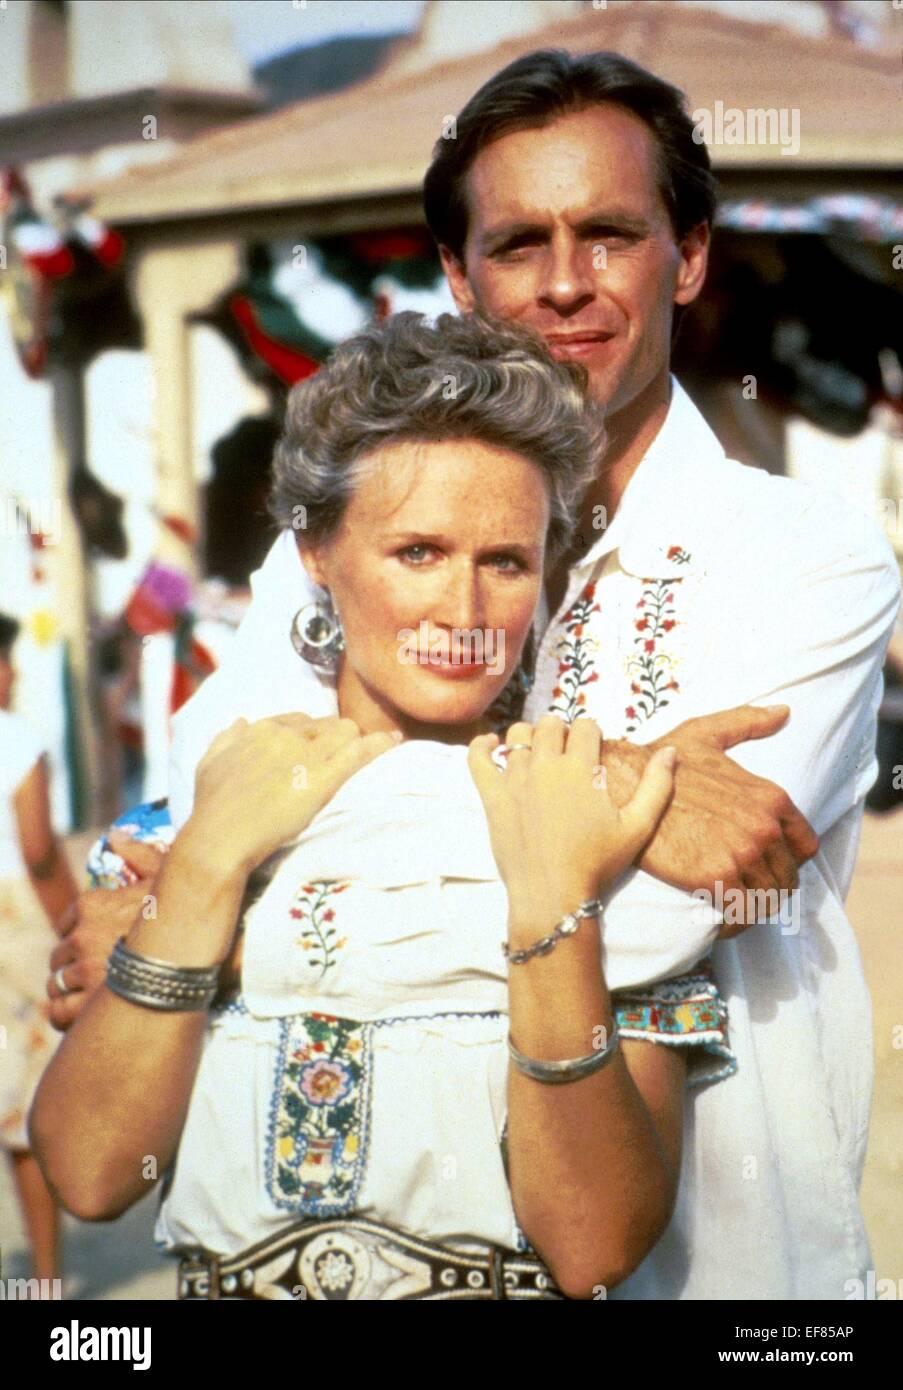 GLENN CLOSE & KEITH CARRADINE THE STONES OF IBARRA (1988) - Stock Image